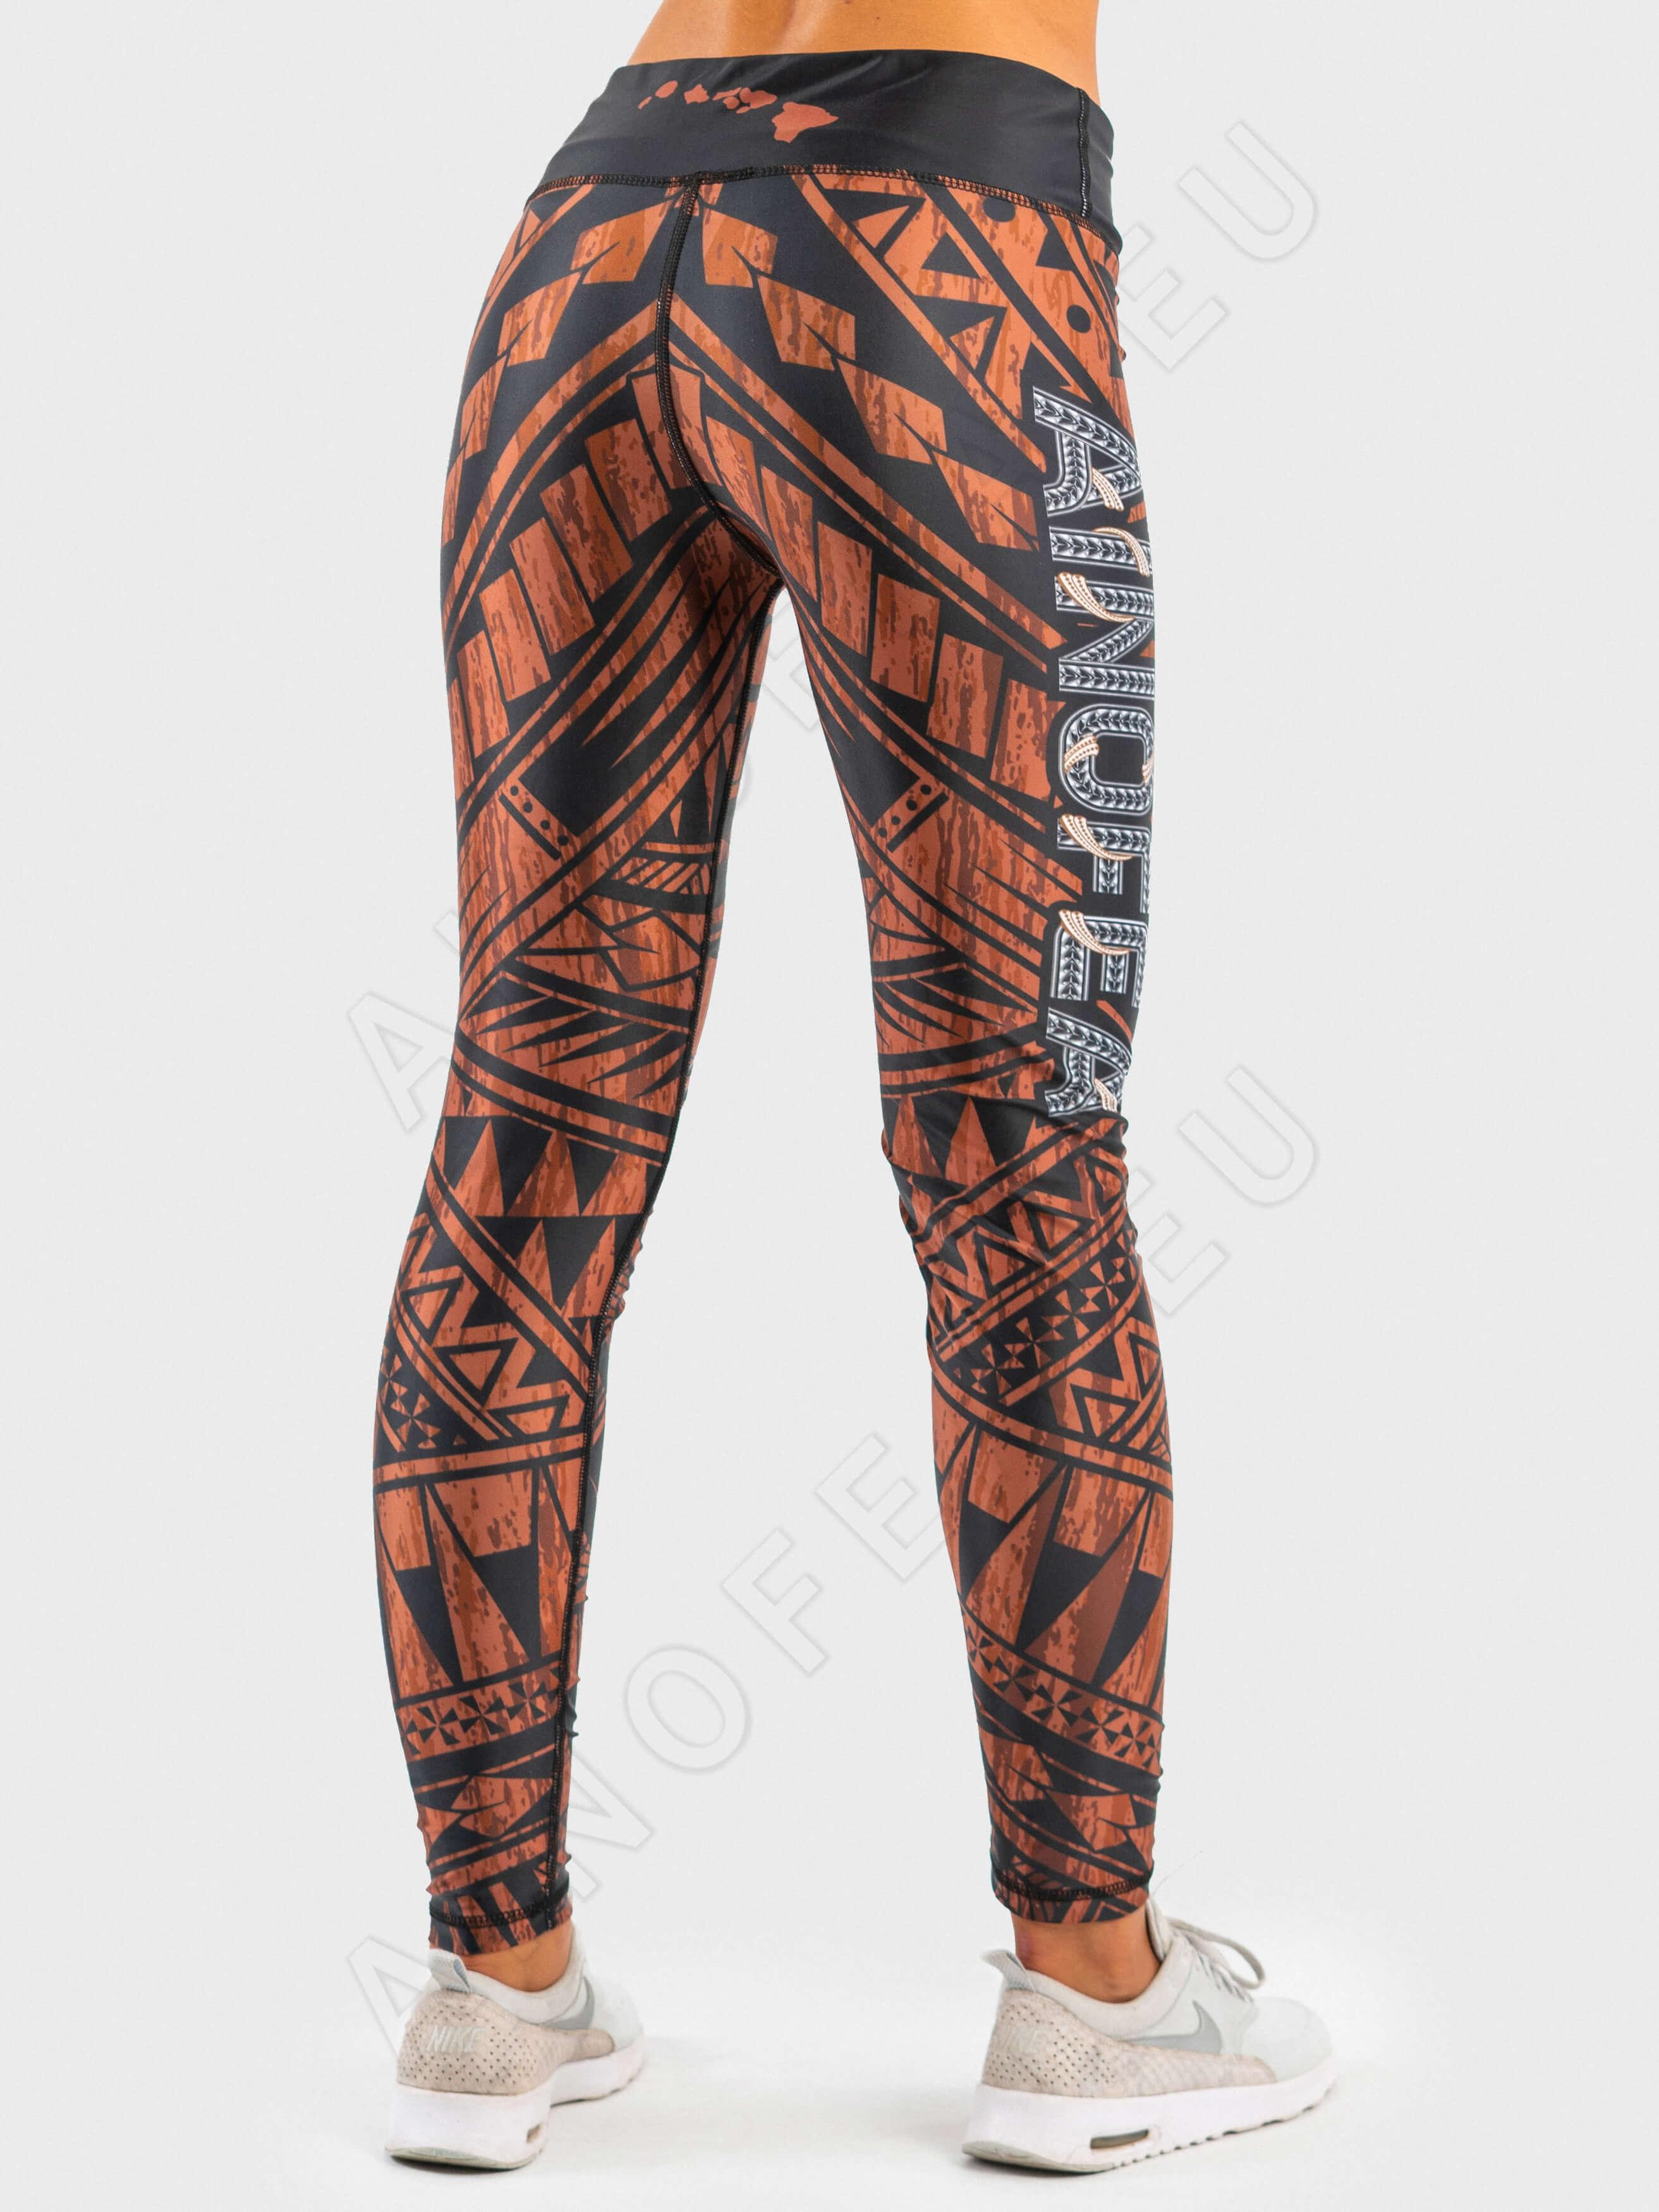 ainofea maui women's tights